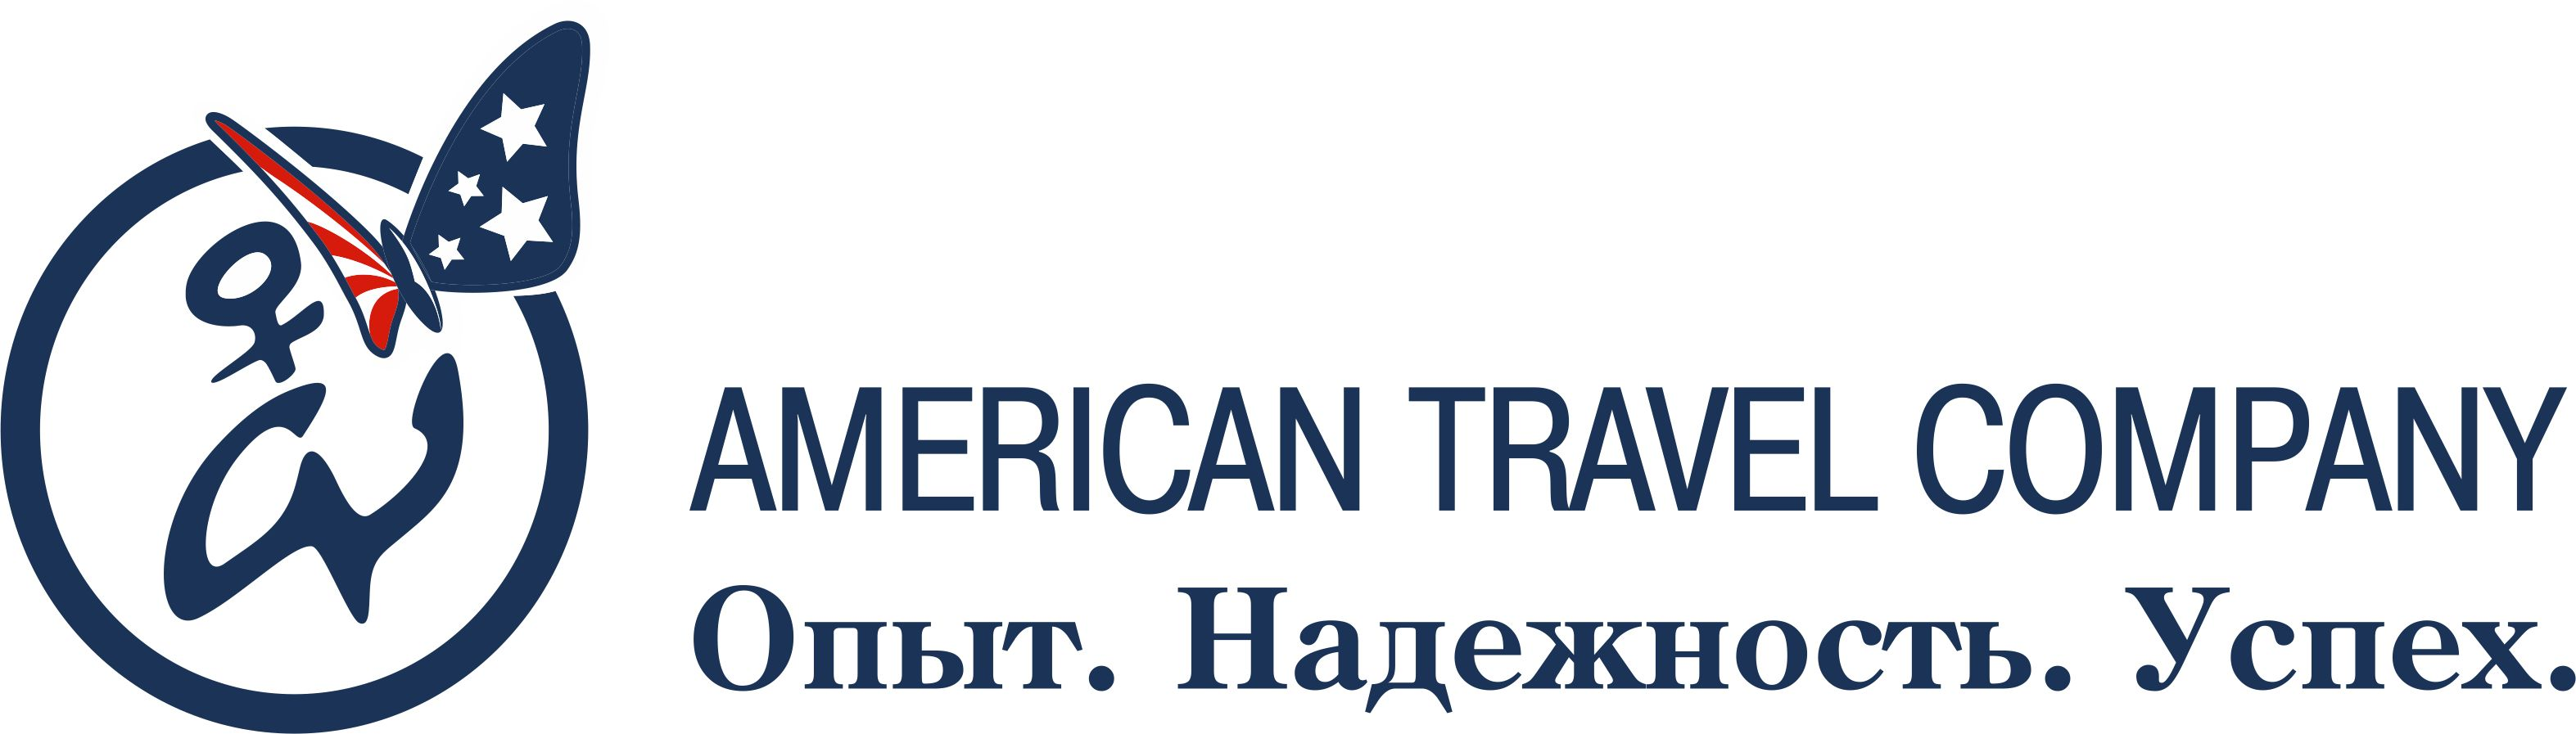 Aviasales ru сравнивает цены на авиабилеты